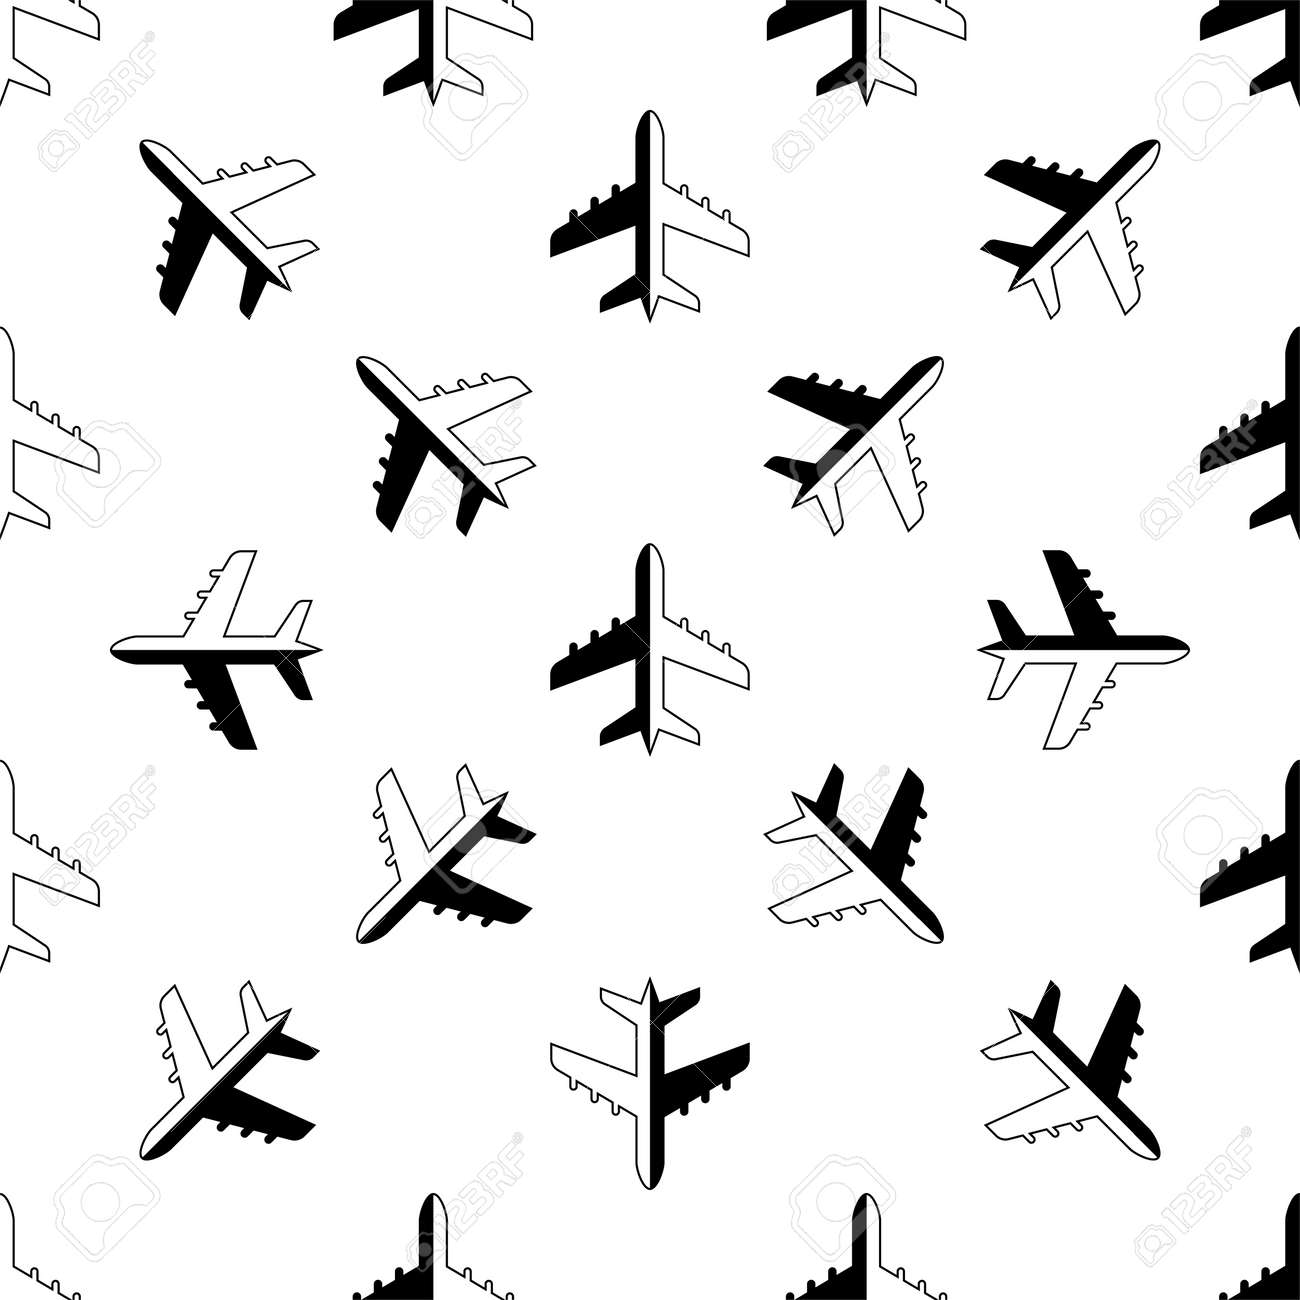 Airplane Icon Seamless Pattern Vector Art Illustration - 148090740